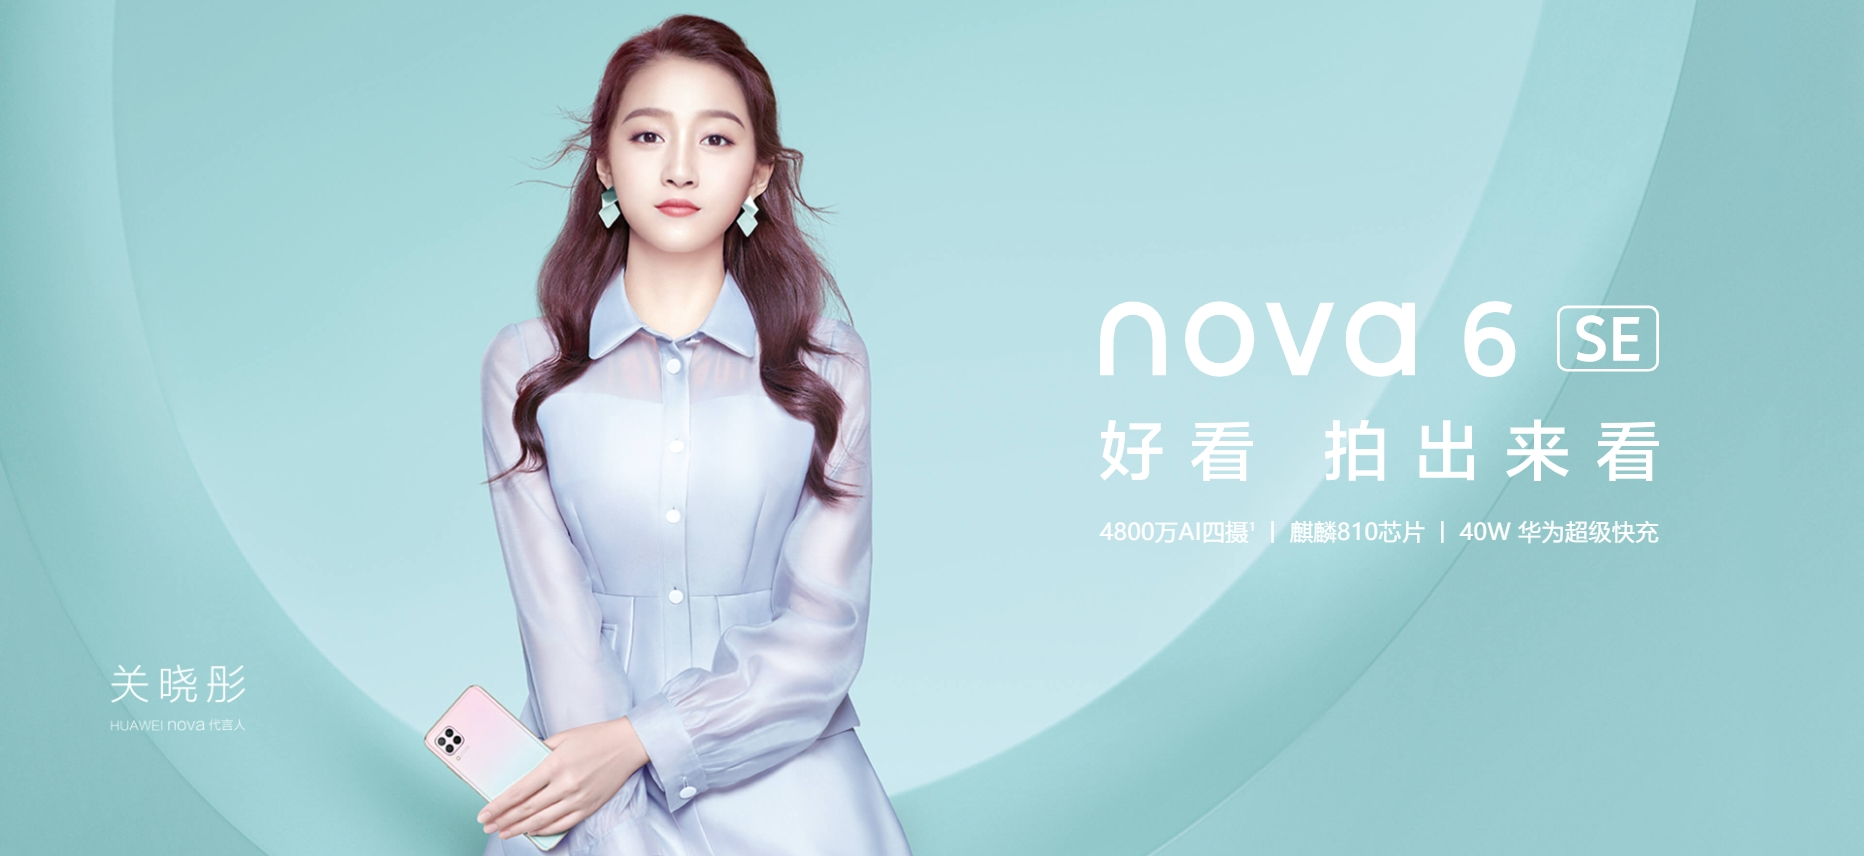 Huawei nova 6 SE Also Announced, Priced at RMB 2,199 17